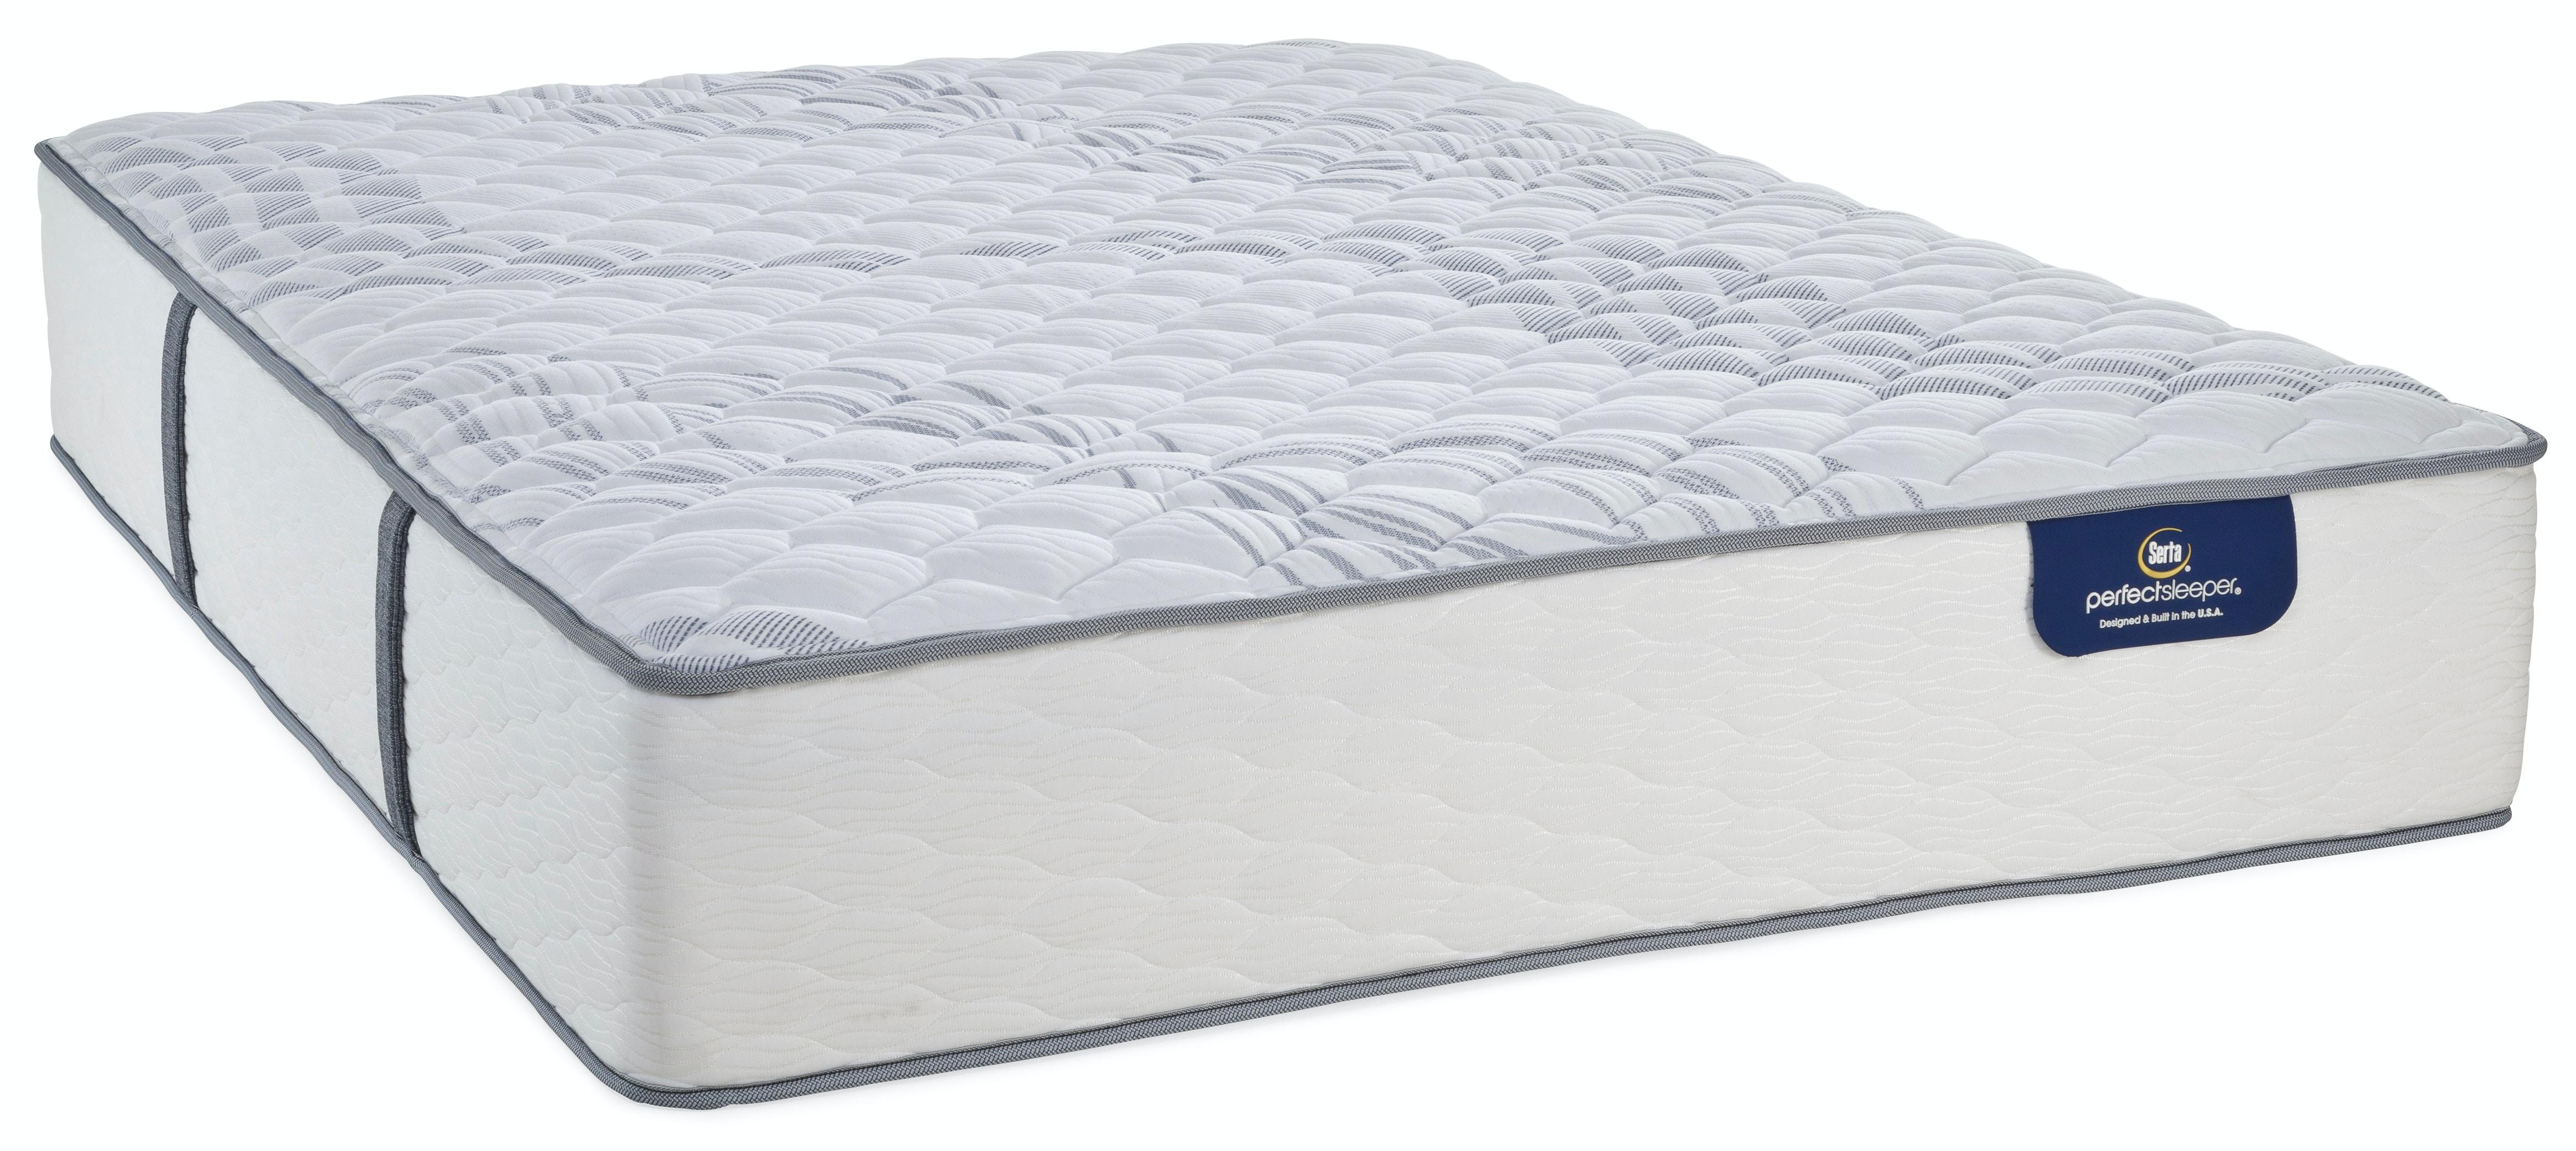 Serta Perfect Sleeper Elite Worley Extra Firm Mattress   QUEEN ST:483878